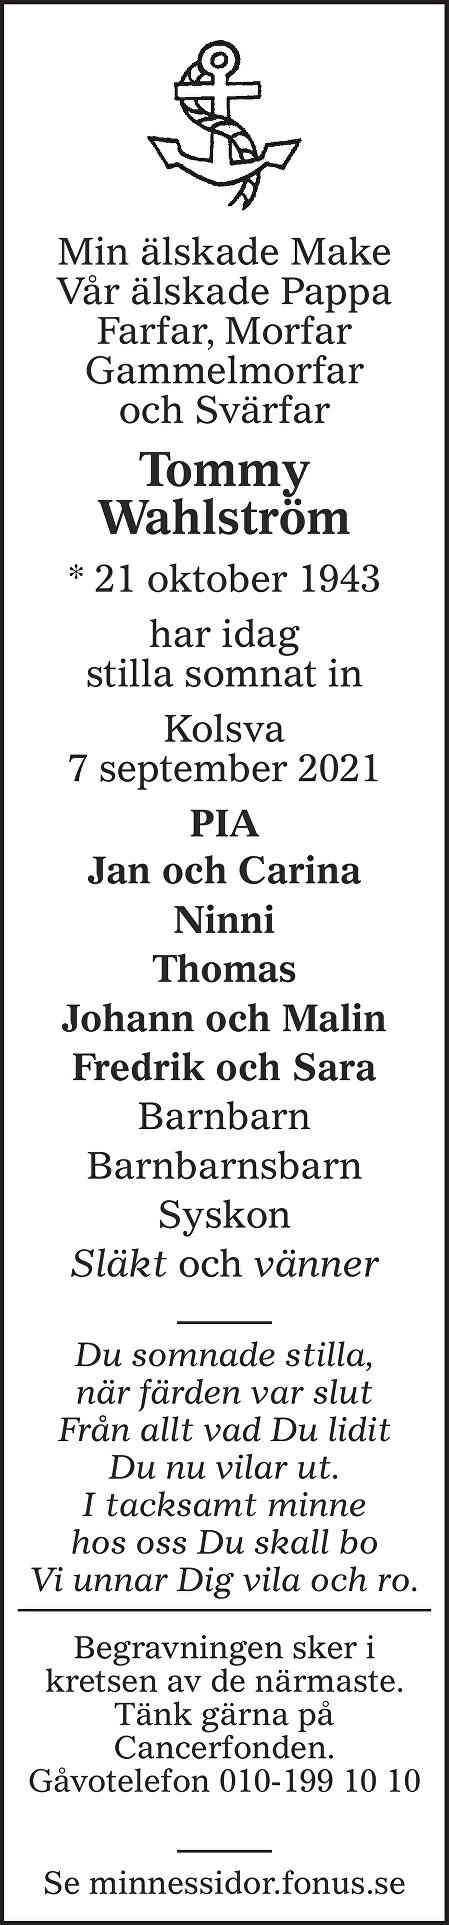 Tommy Wahlström Death notice